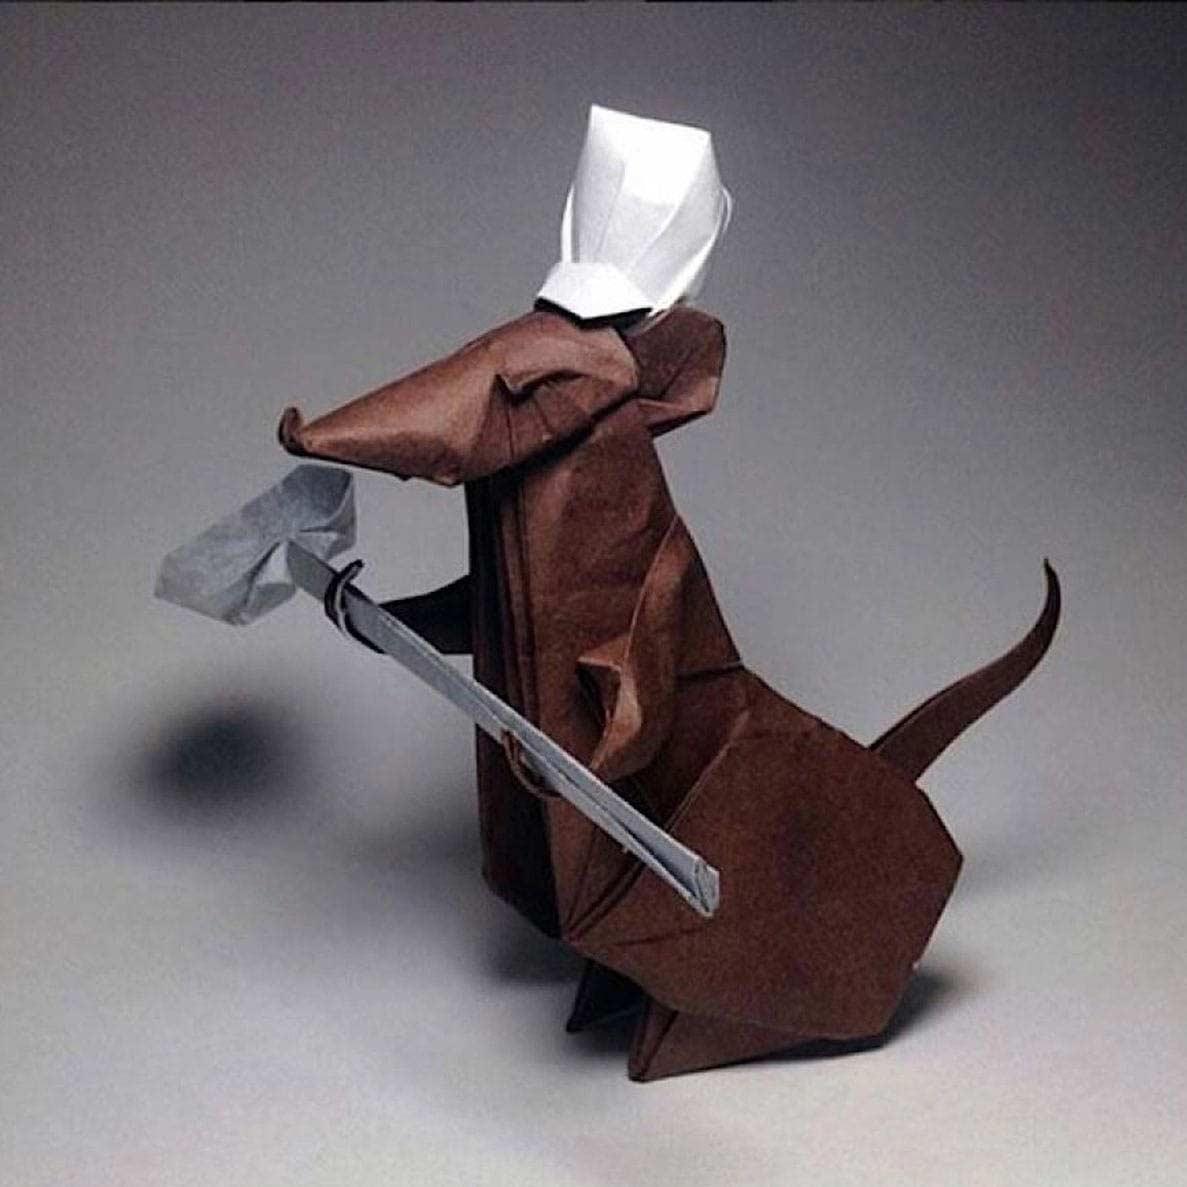 Geniale Origami-Kunstwerke von Robby Kraft